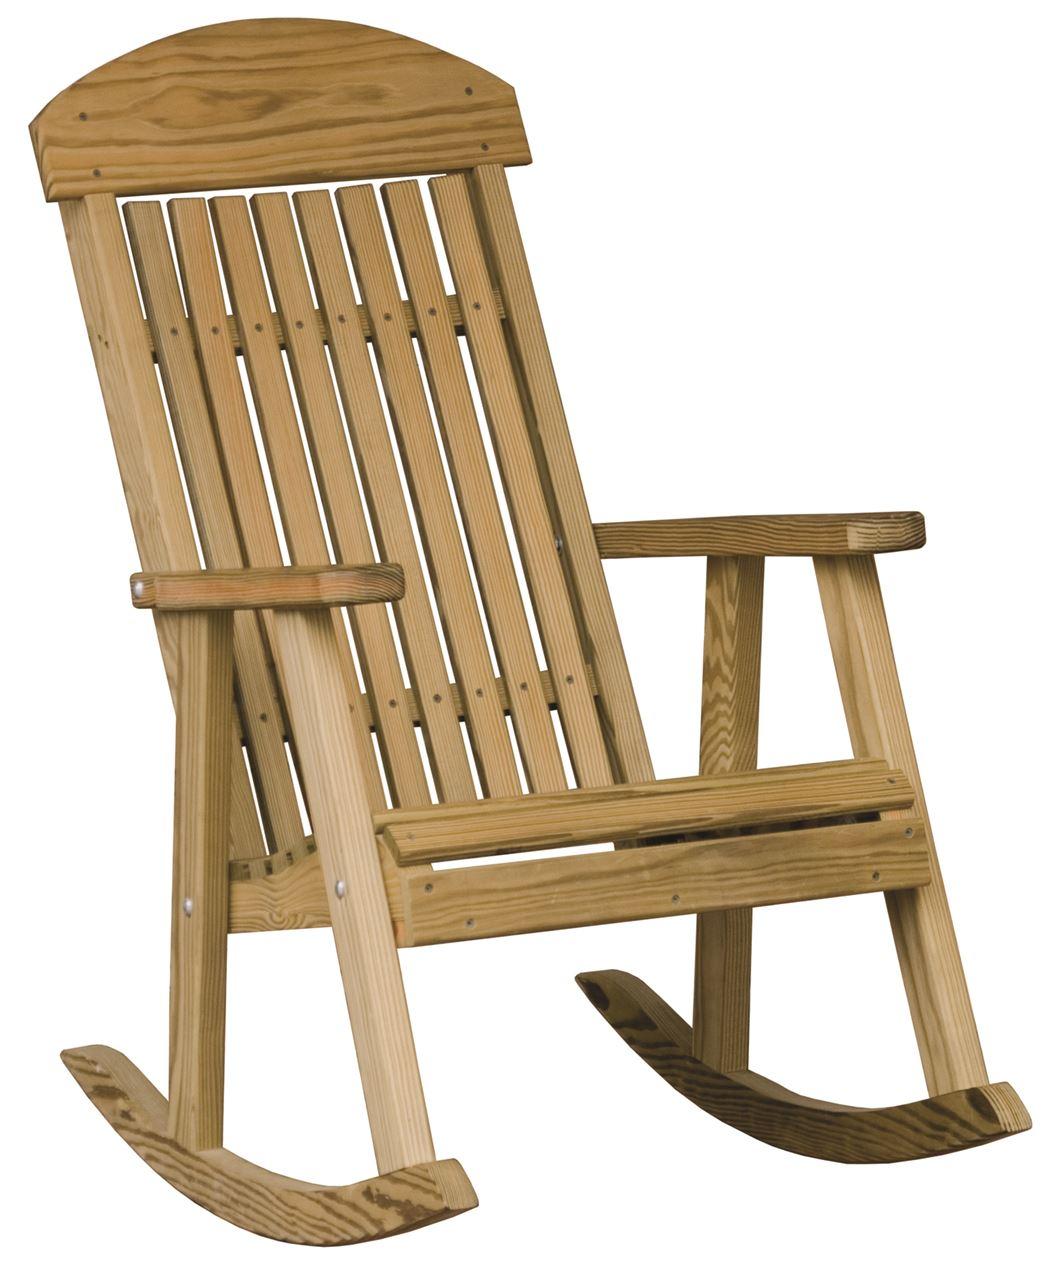 Furniture luxcraft wood deck chairs luxcraft wood porch rocker